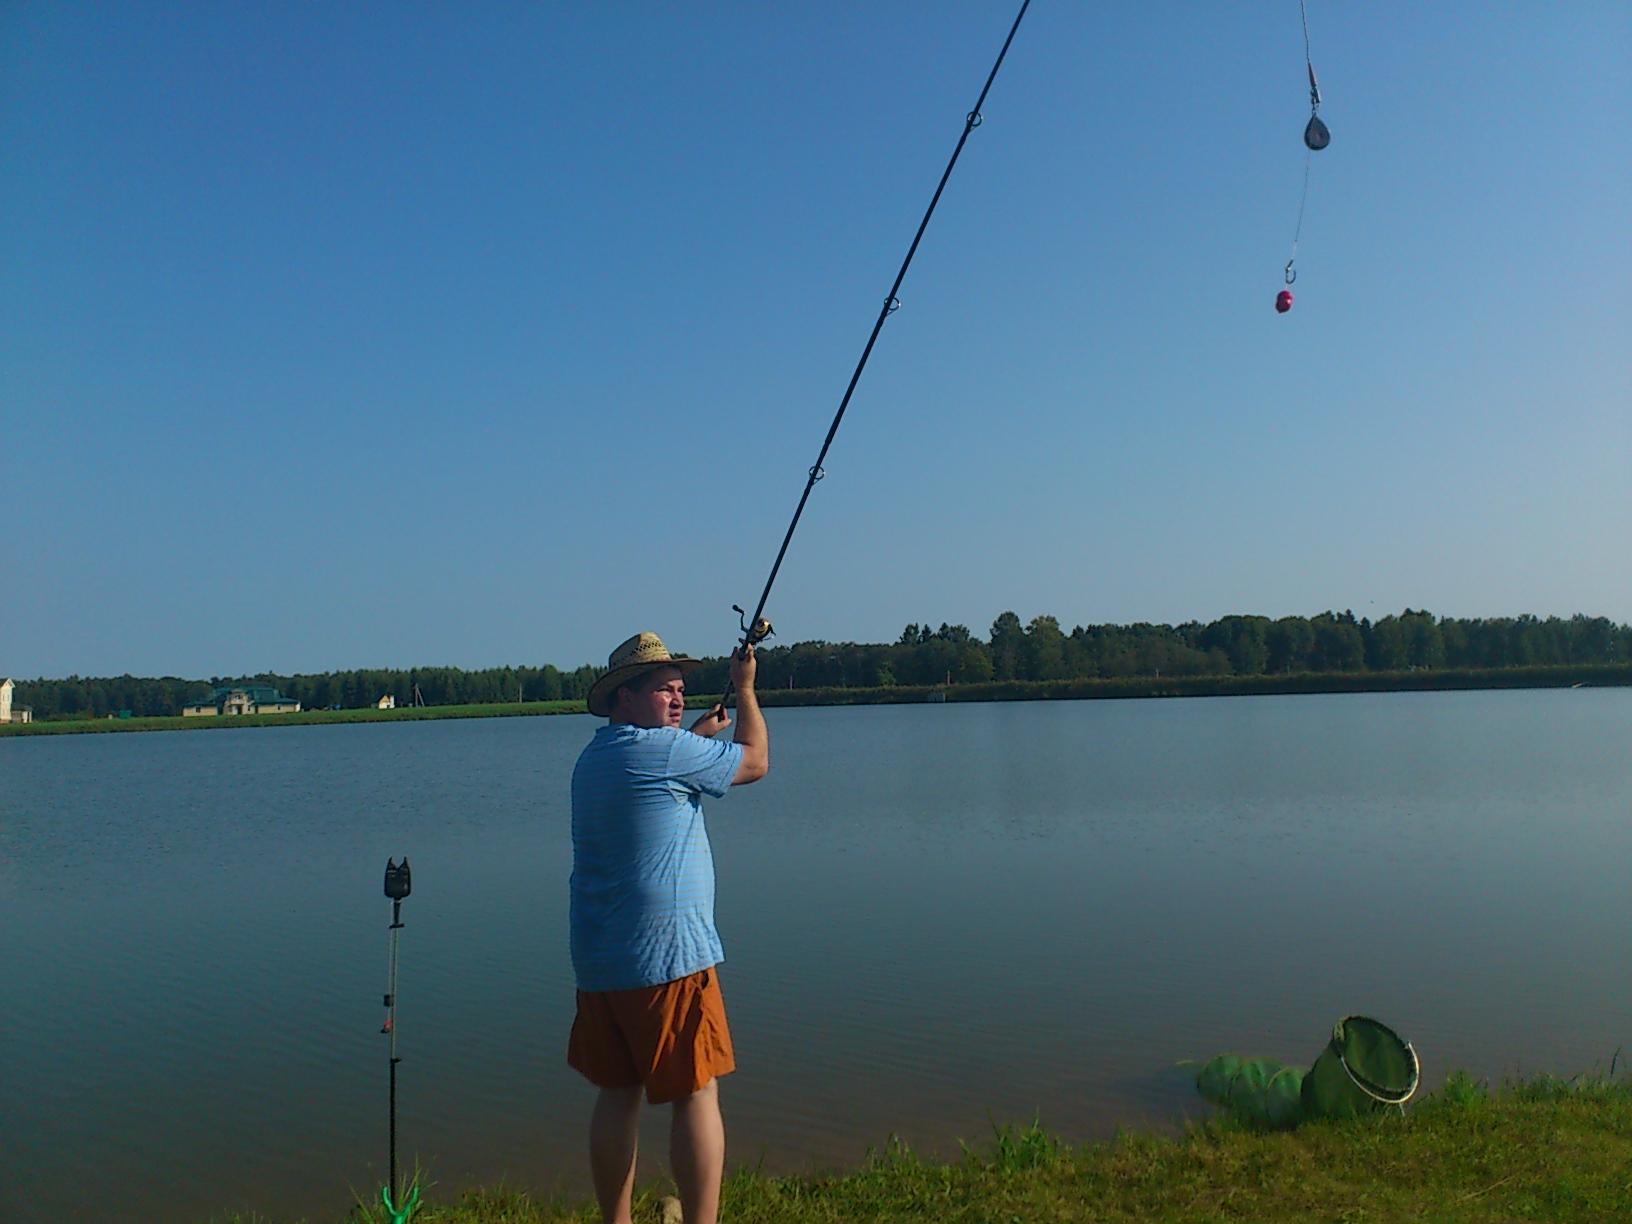 как ловить толстолобика на реке